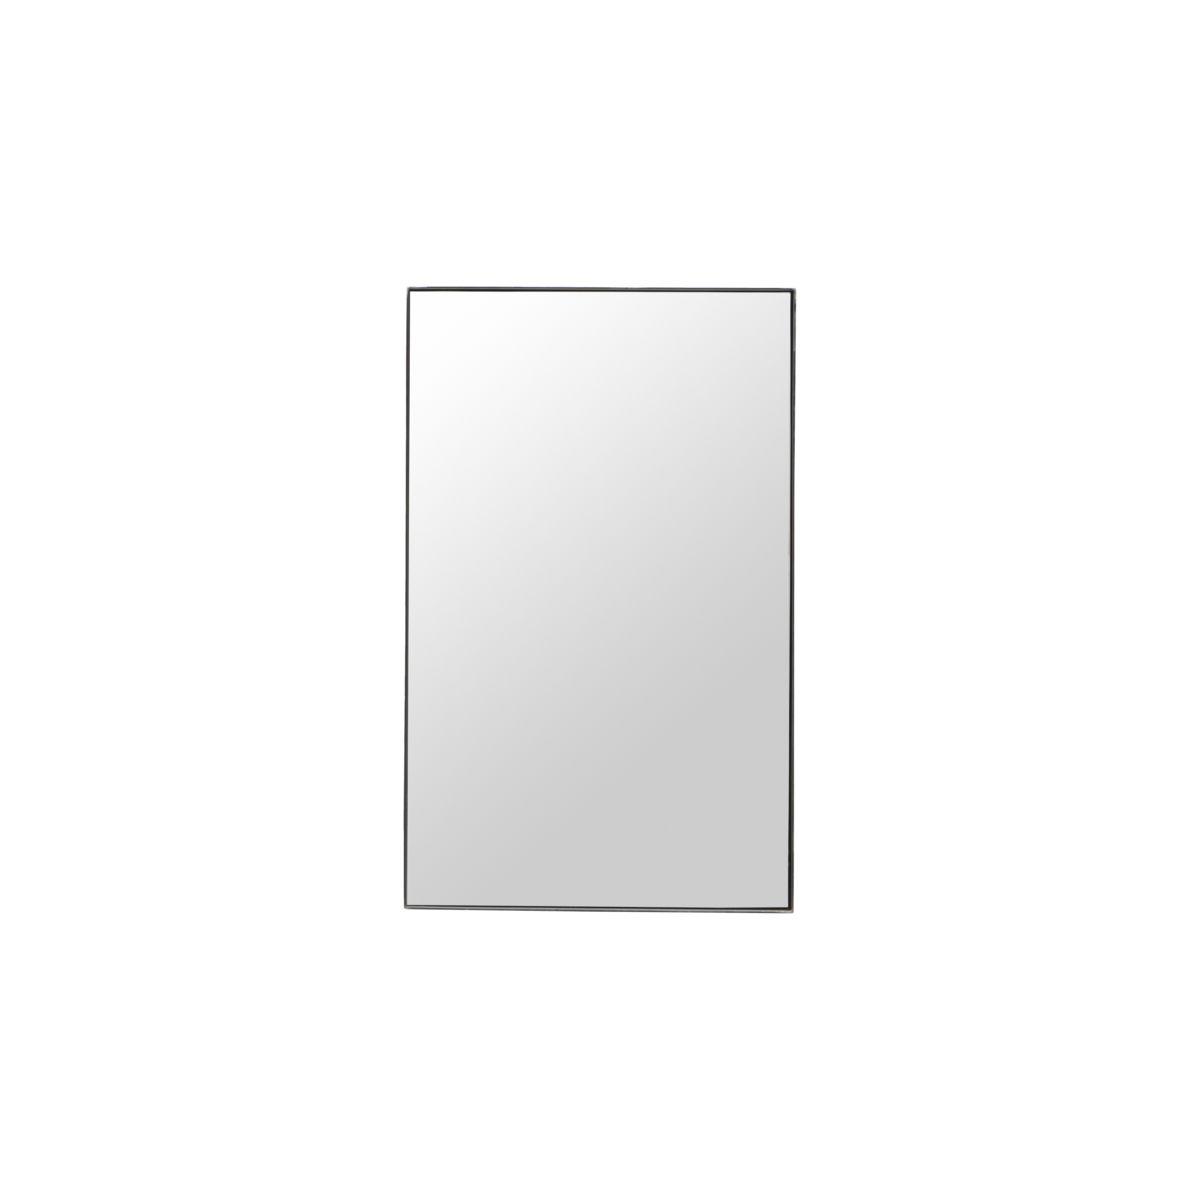 Spegel med ram, Raw House Doctor